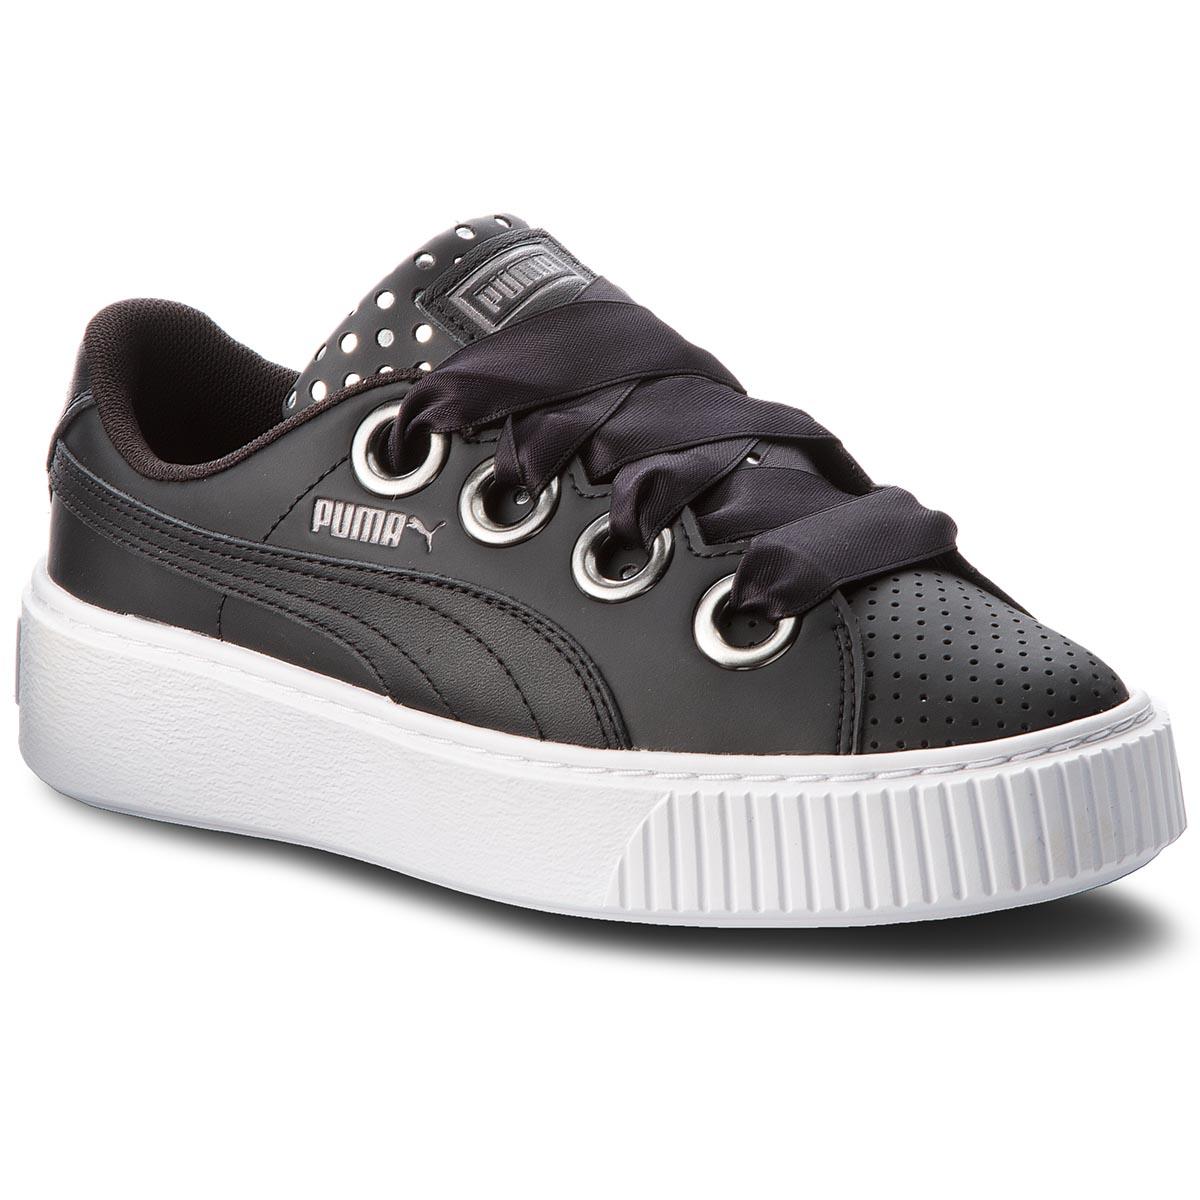 White En0en00543 100 Sneaker Tommy Wedge Casual Sneakers Jeans xdBWroeC